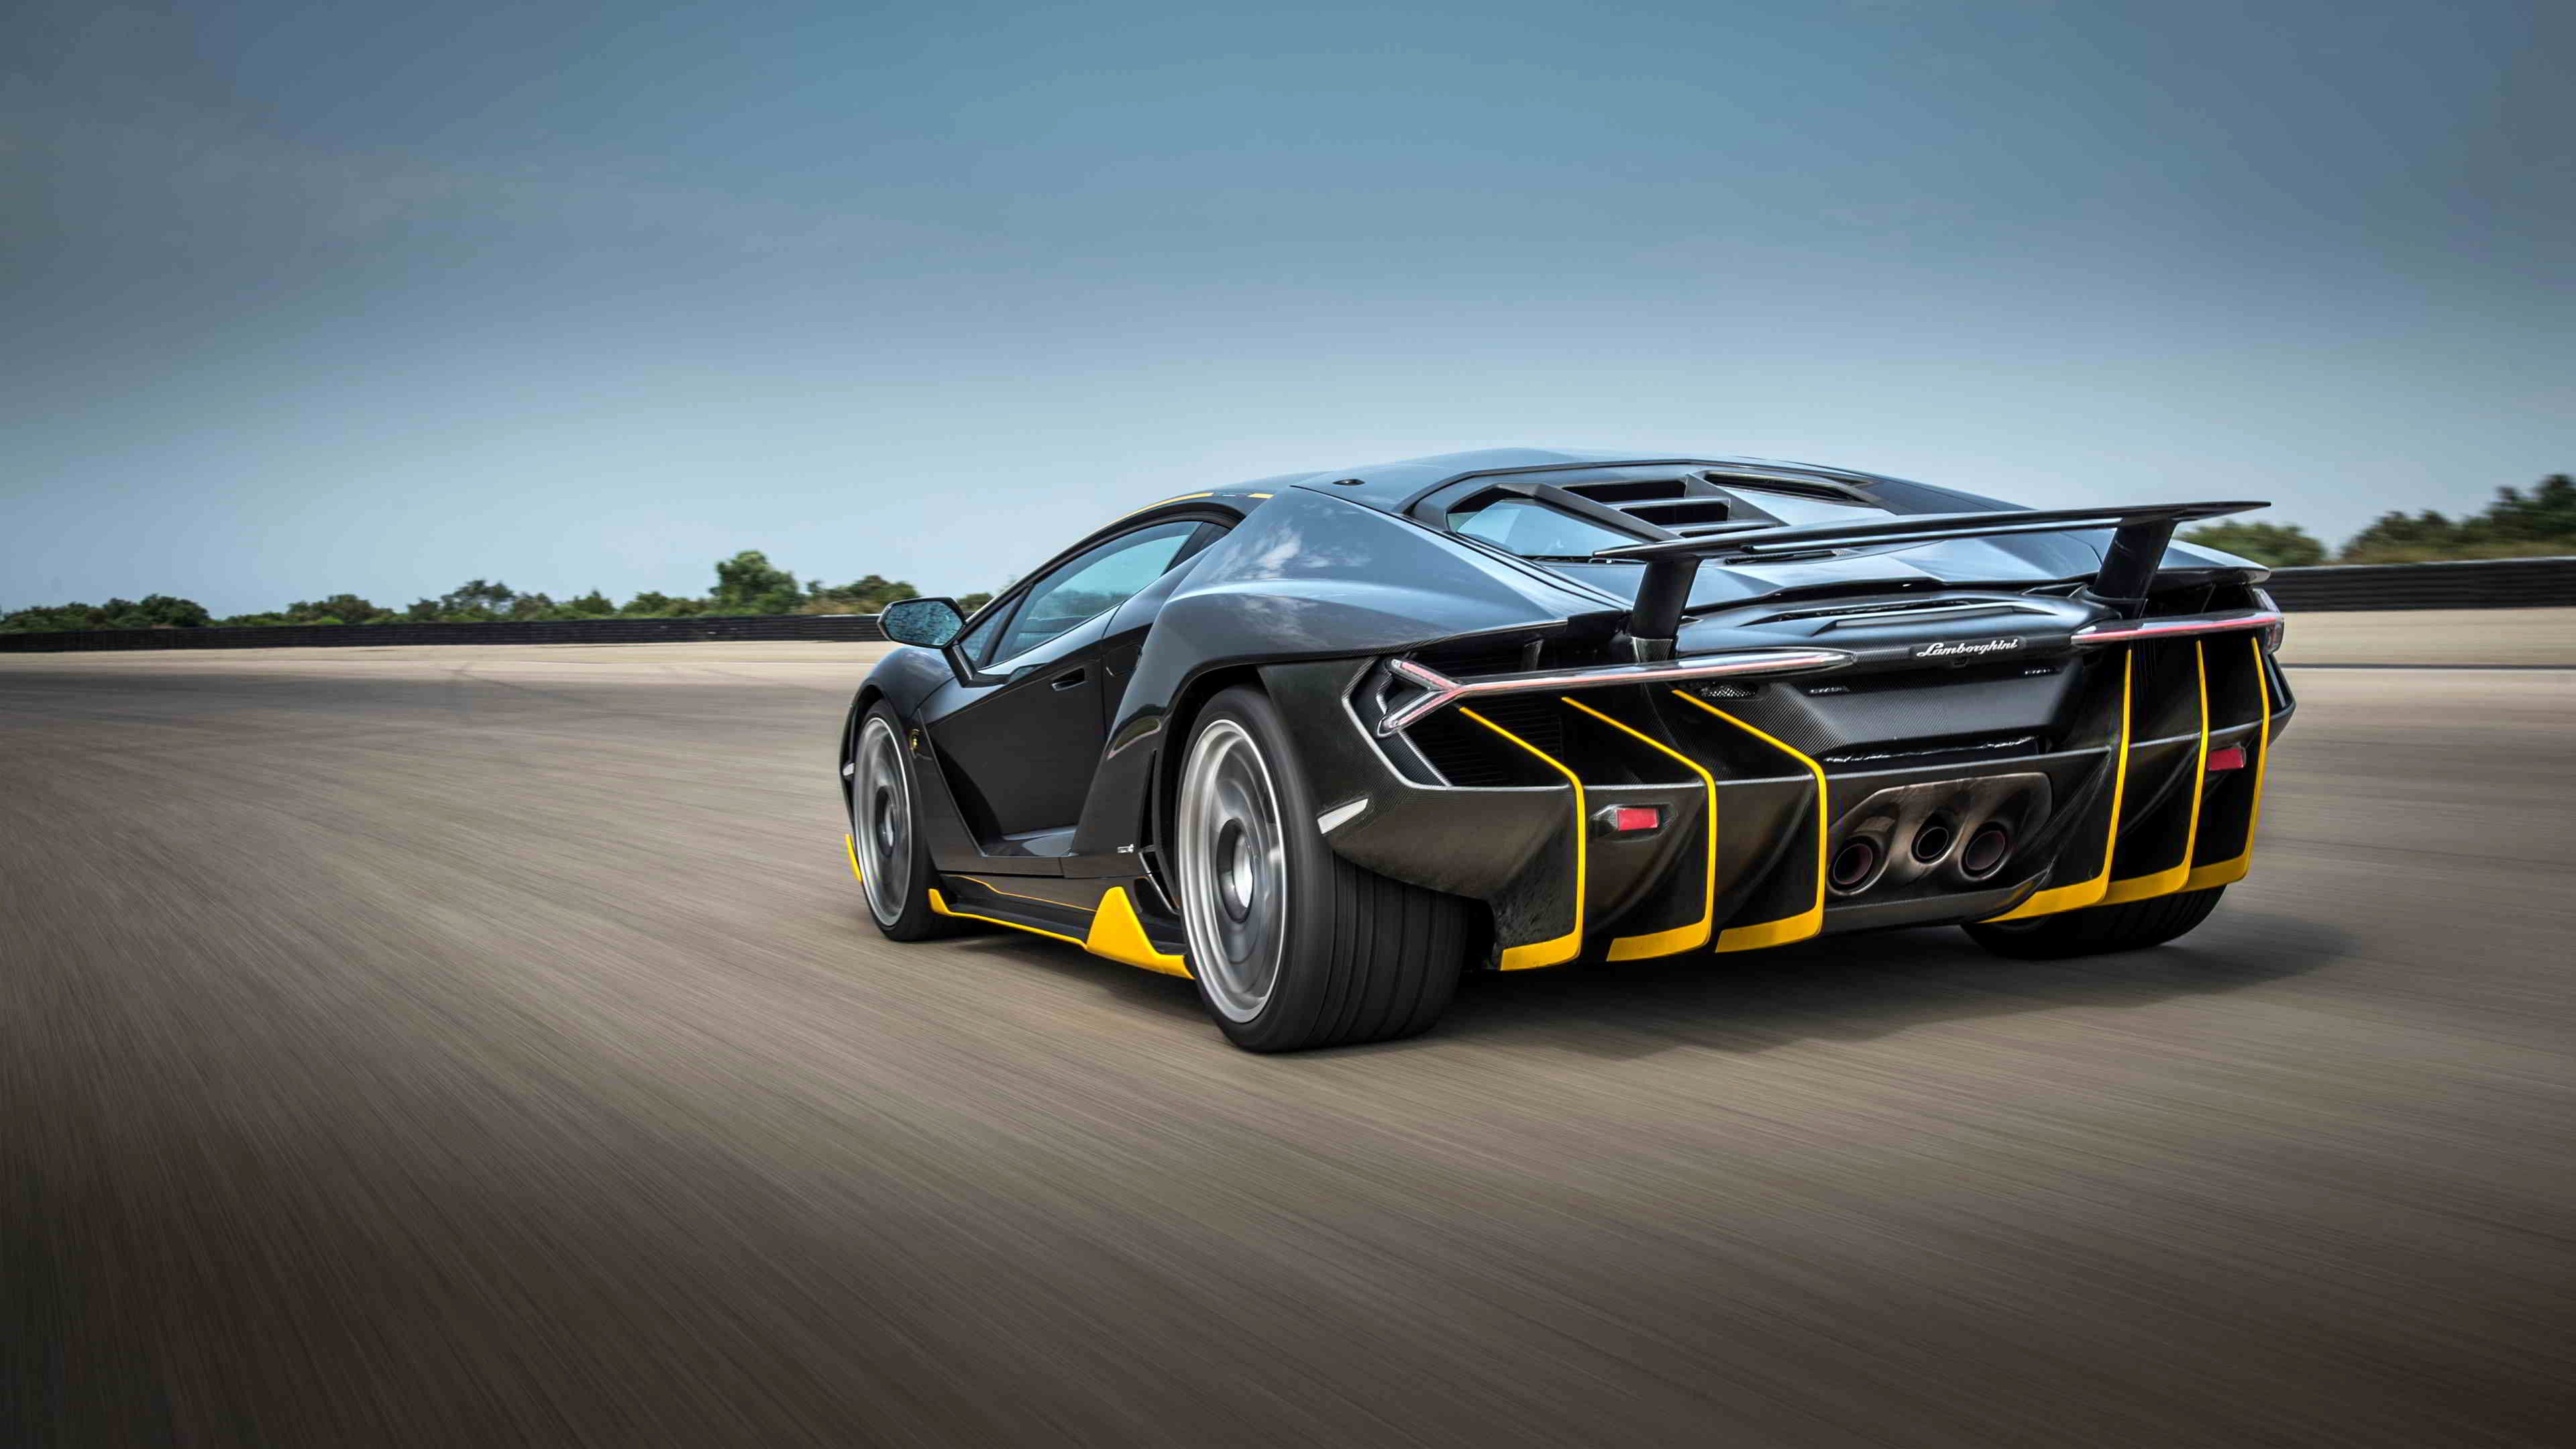 79 Hd Laptop Wallpapers On Wallpaperplay Lamborghini Centenario Car Wallpapers Lamborghini